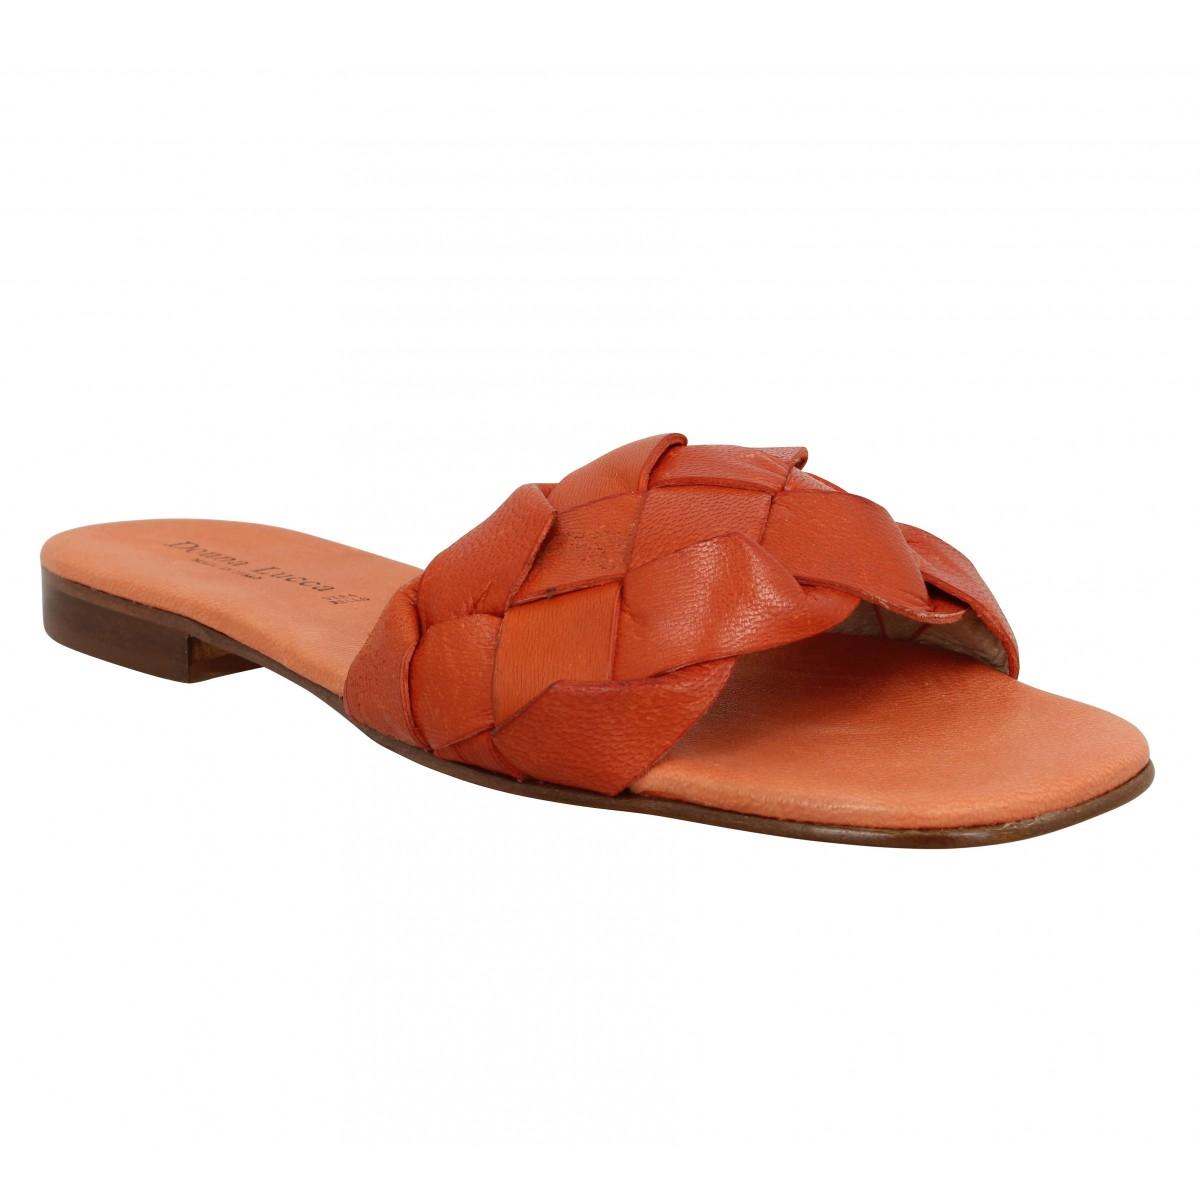 Mules DONNA LUCCA 1282 cuir Femme Orange